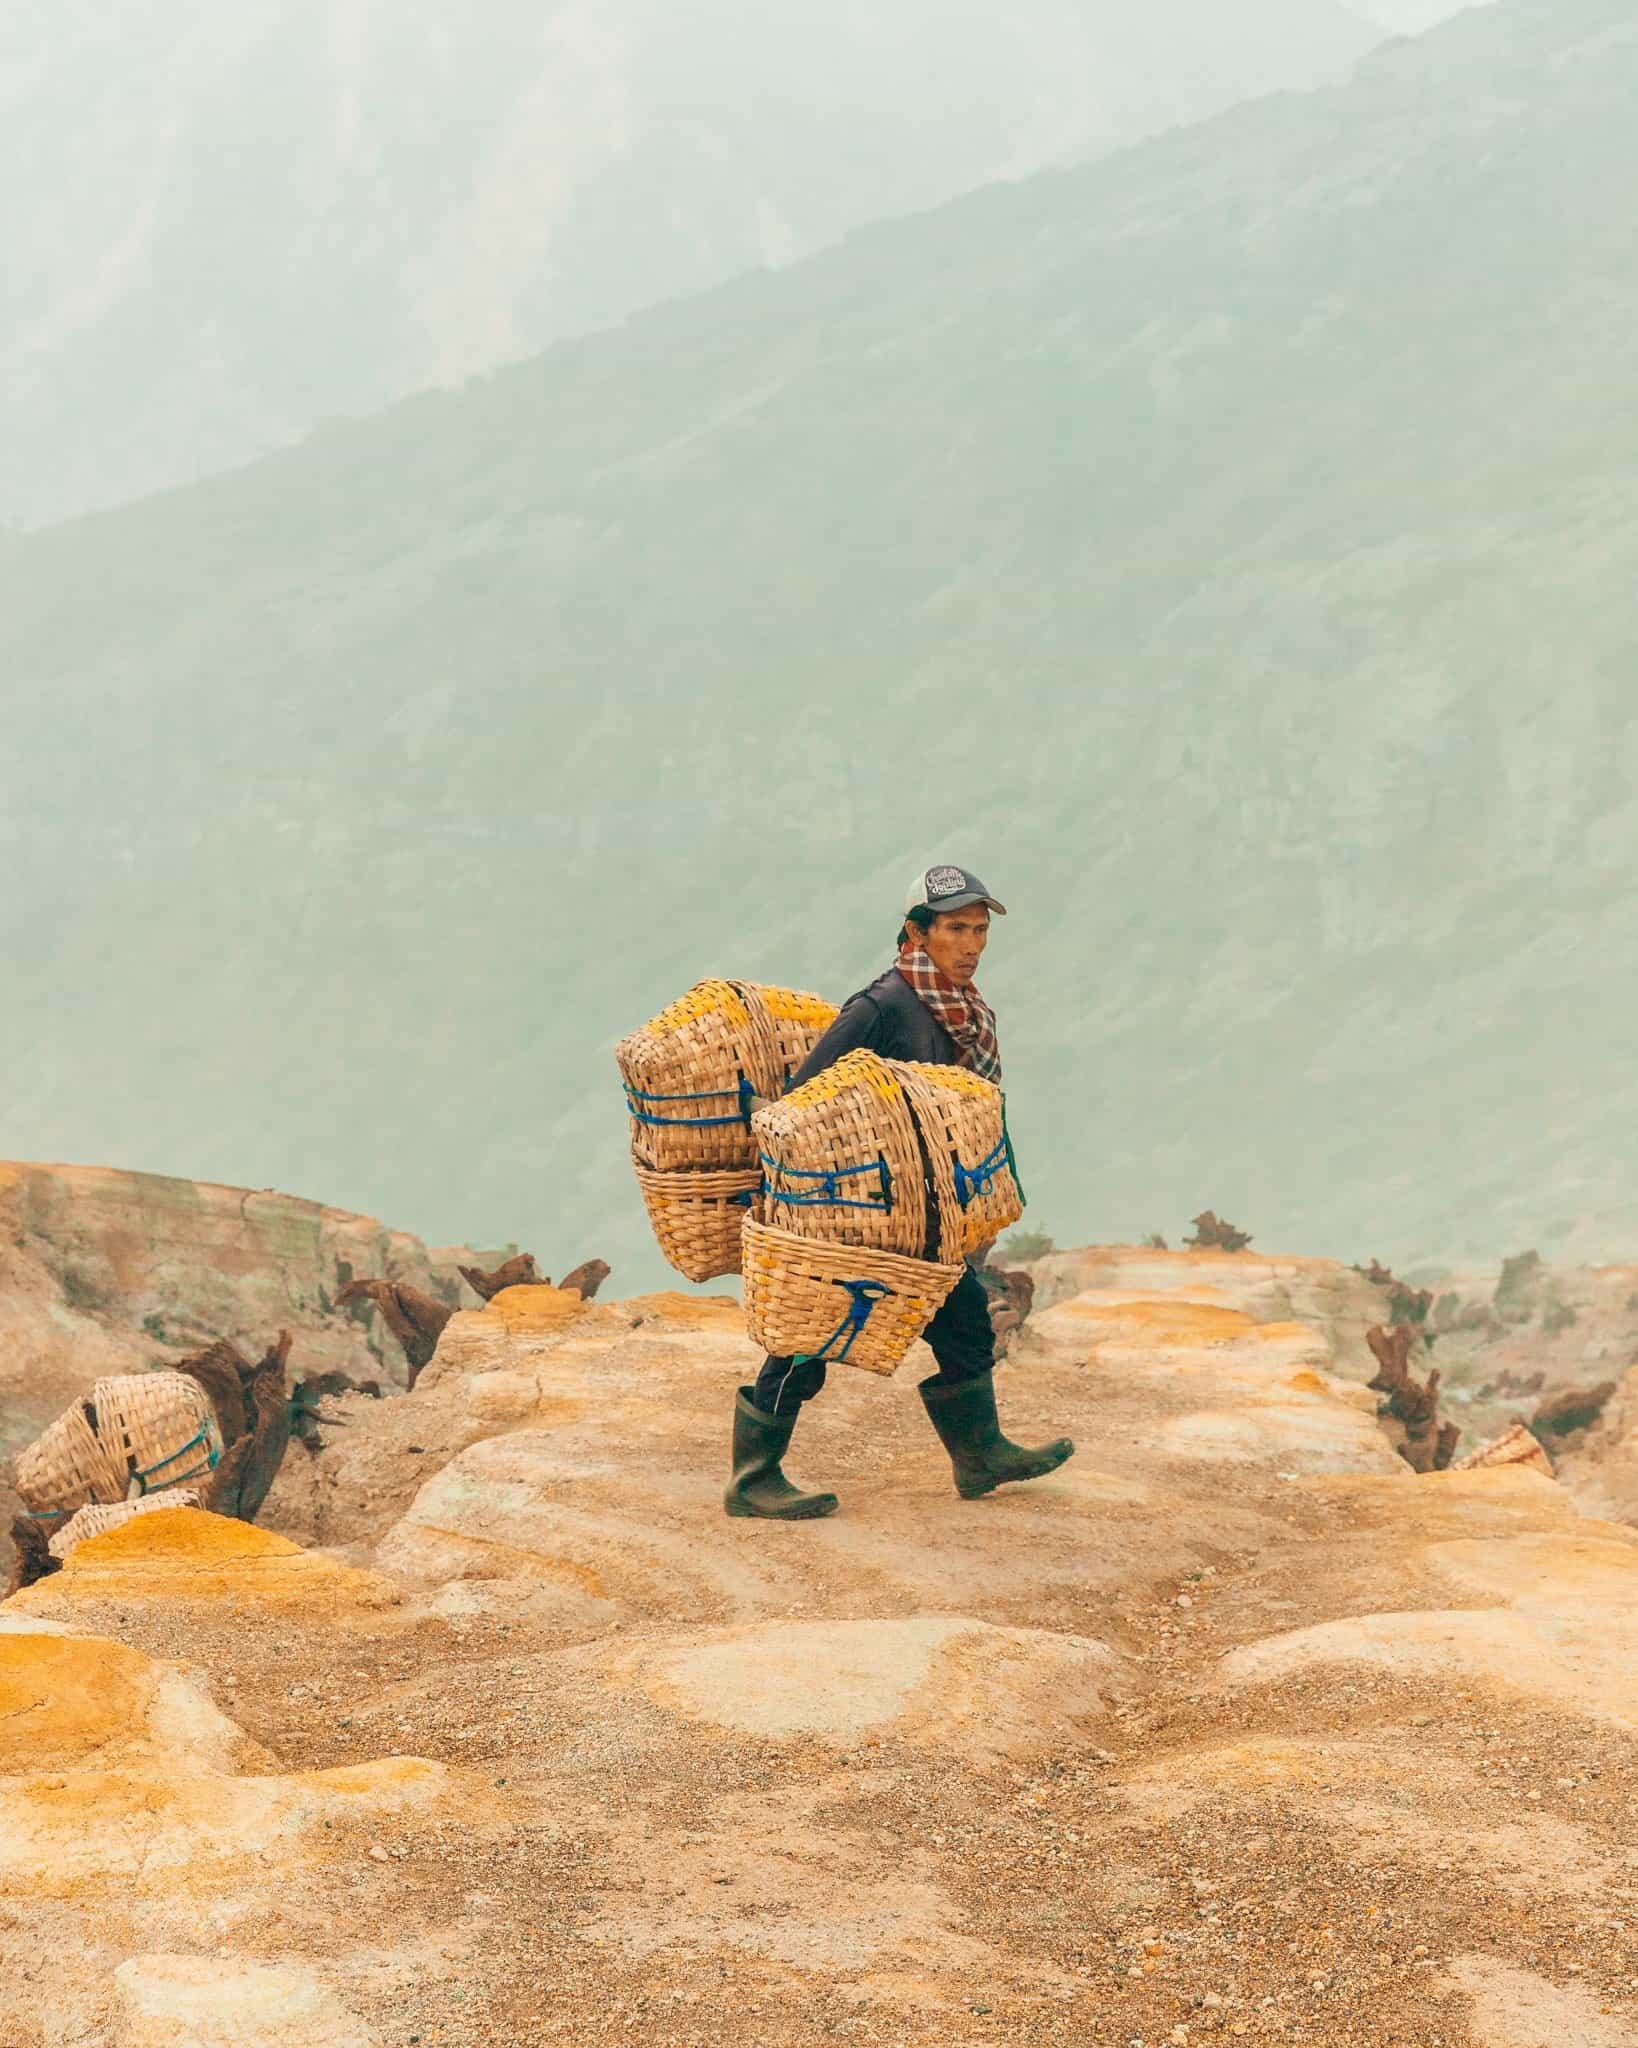 Sulfur Mine Worker on Mount Ijen, East Java - The Next Trip